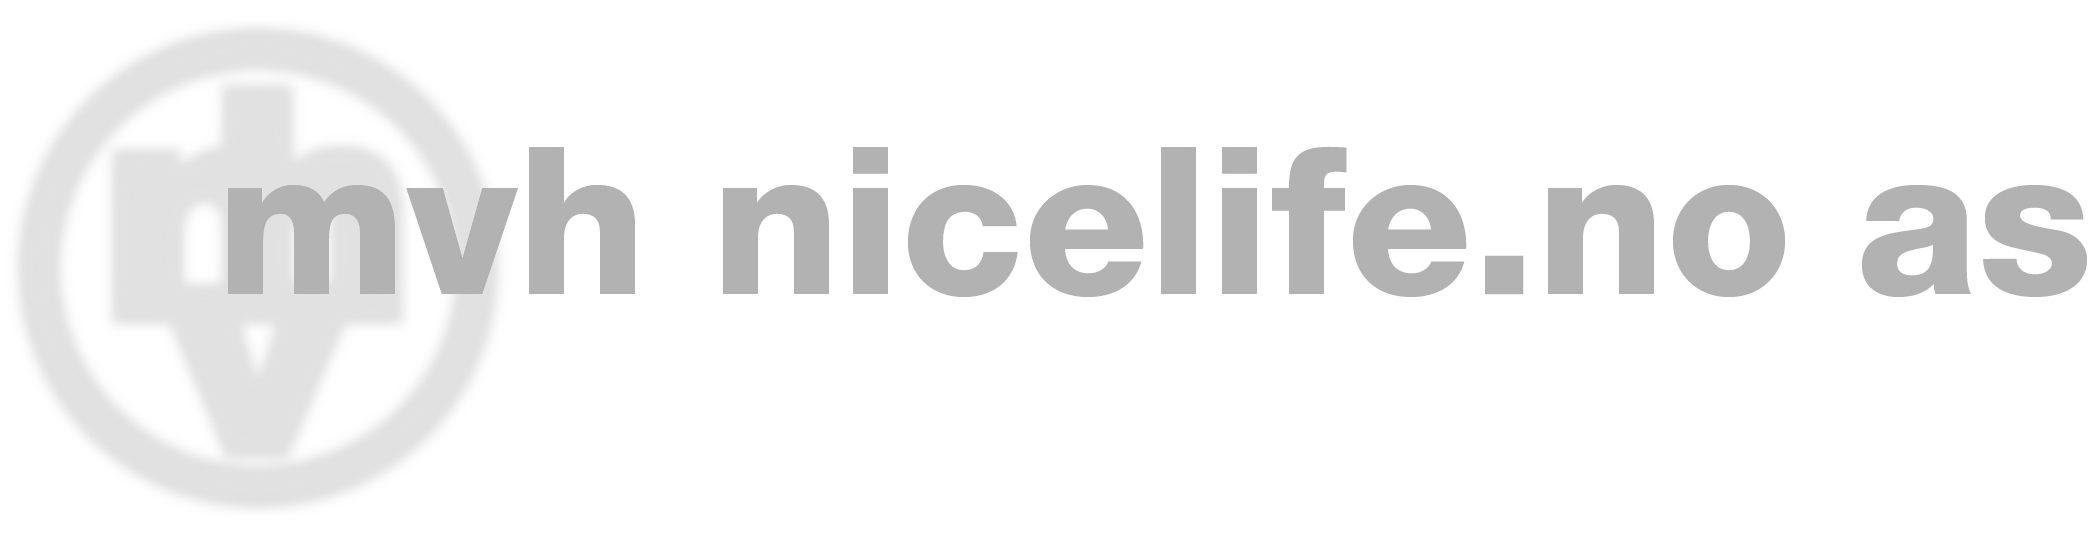 NiceLife